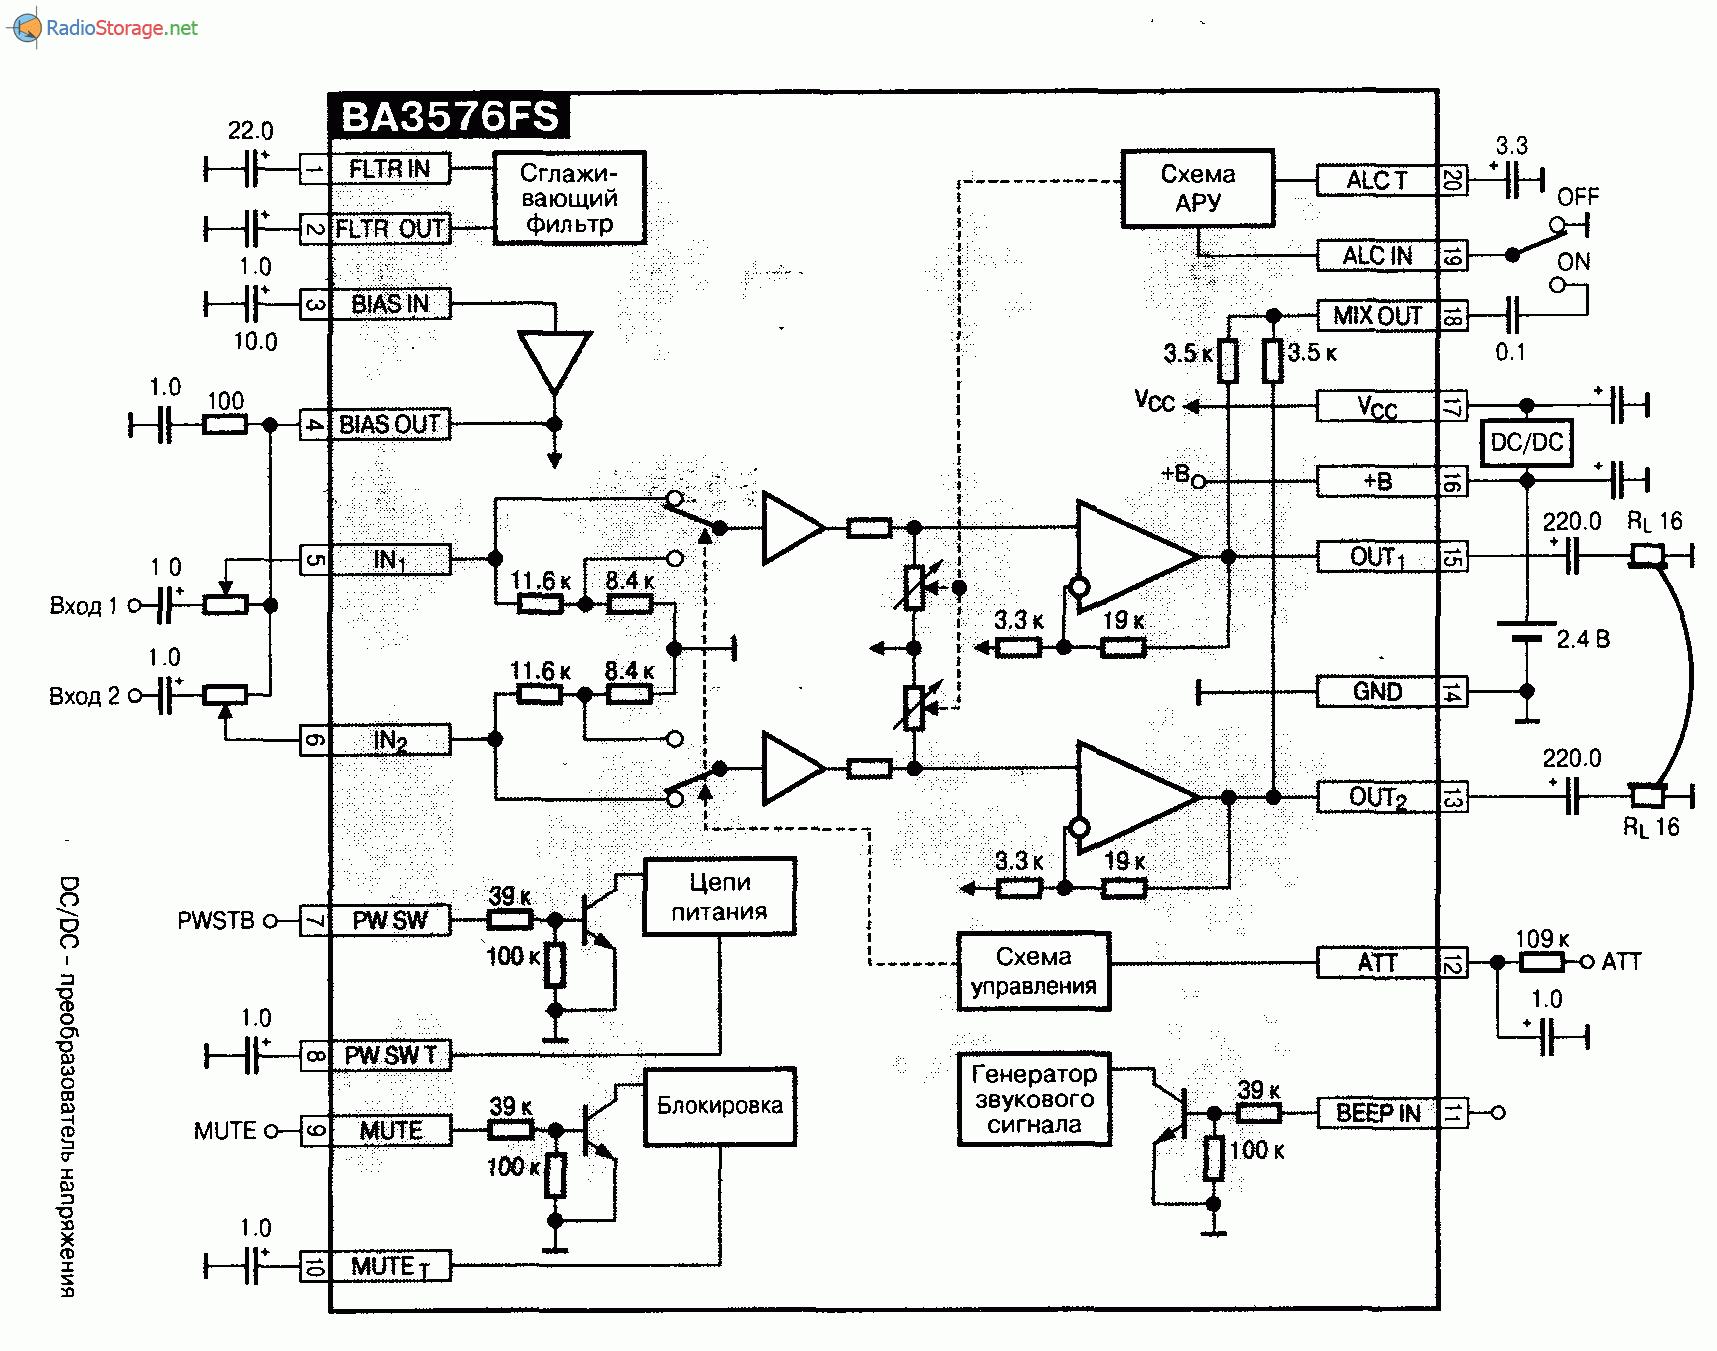 Lc8992 микросхема схема включения